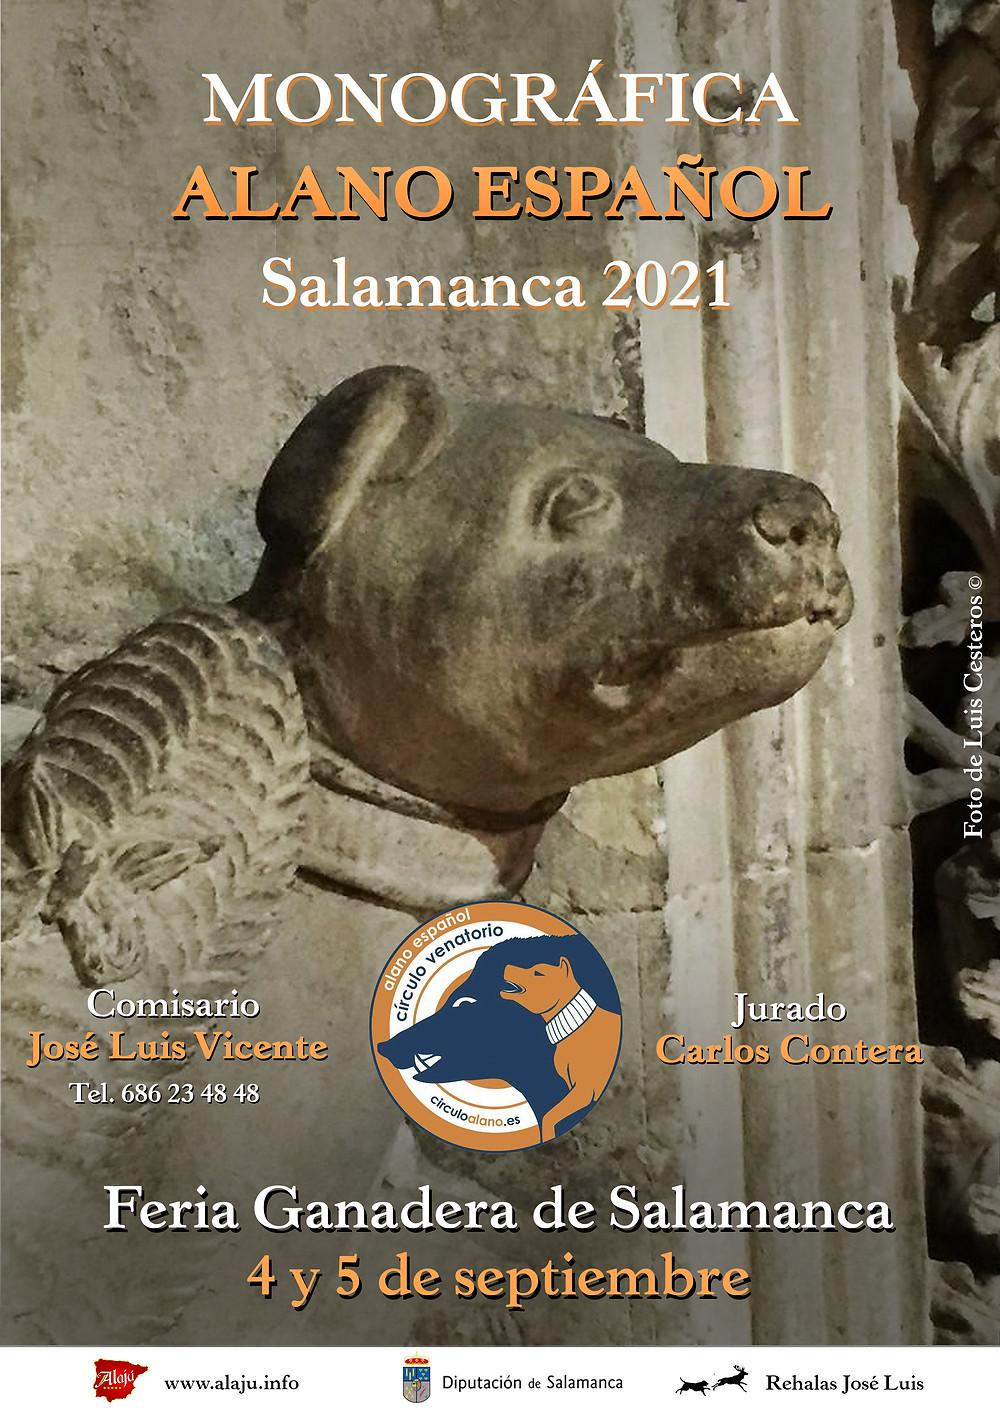 CARTEL Monográfica Alano Español Salamanca 2021